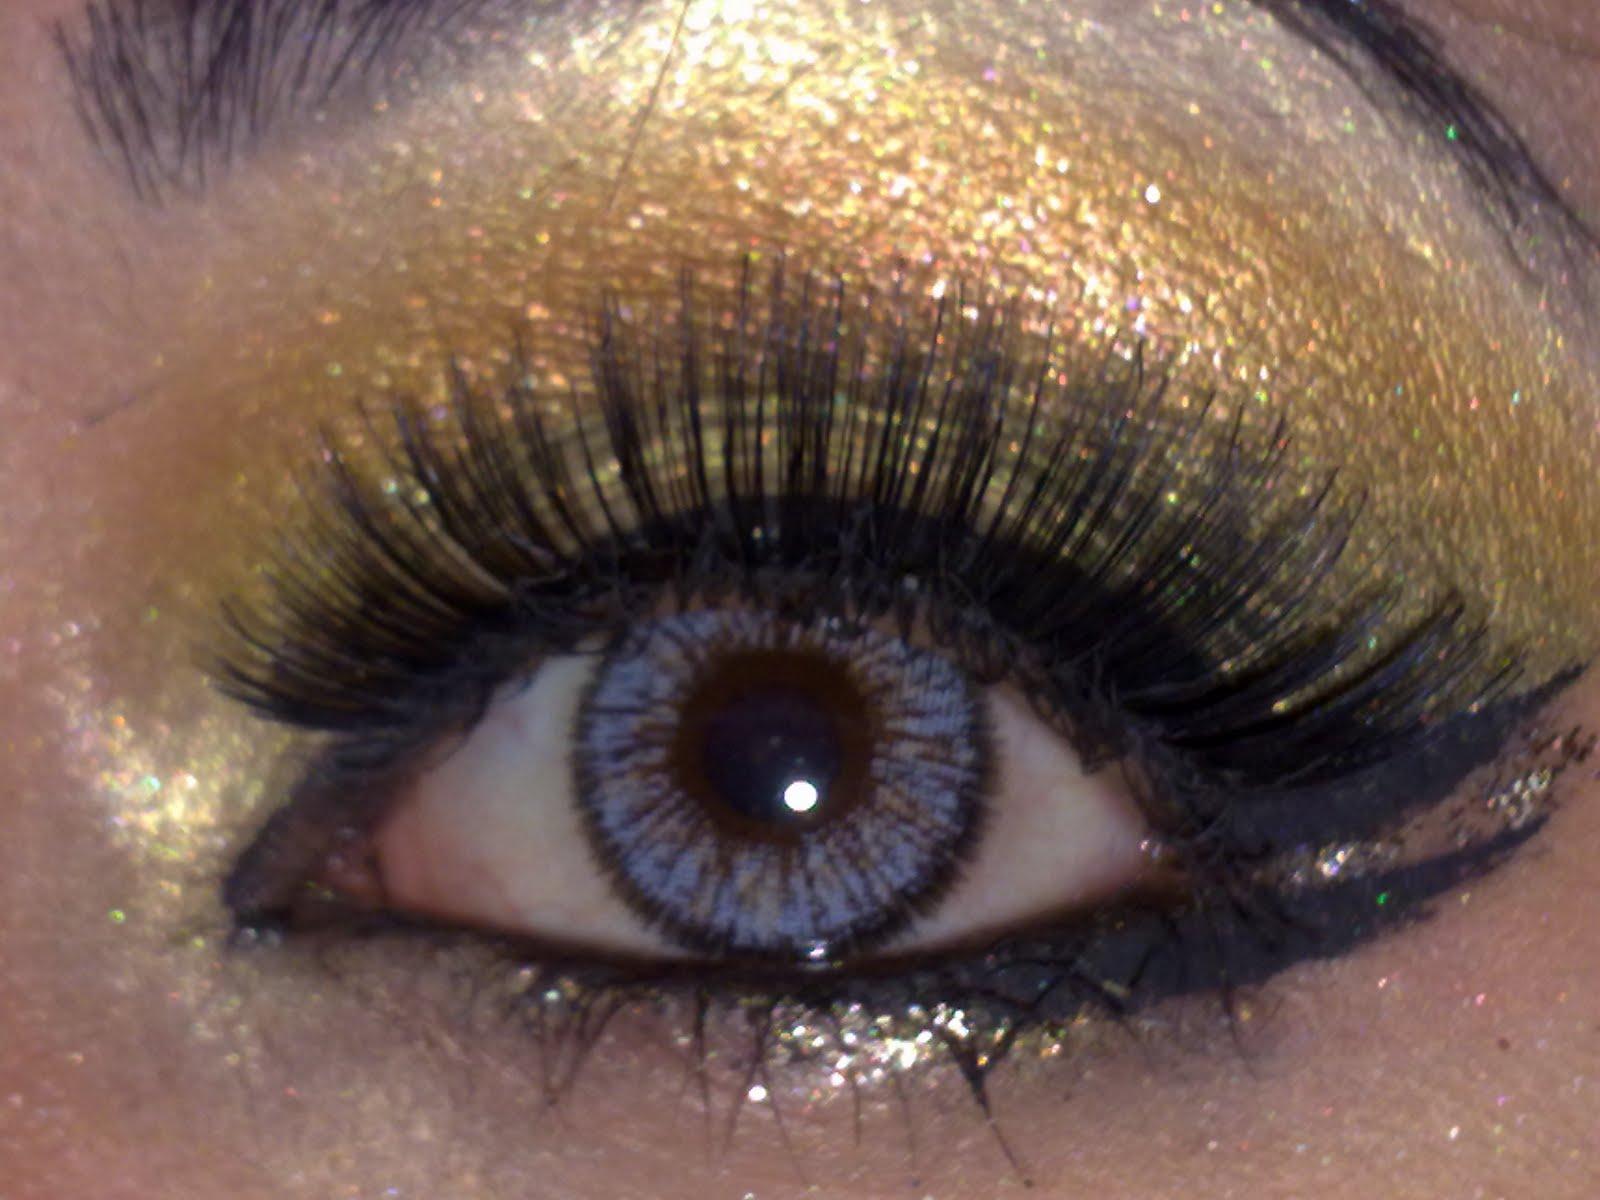 Love Makeup Safira Asian Bridal Makeup Look Goldglitter Smokey Eye